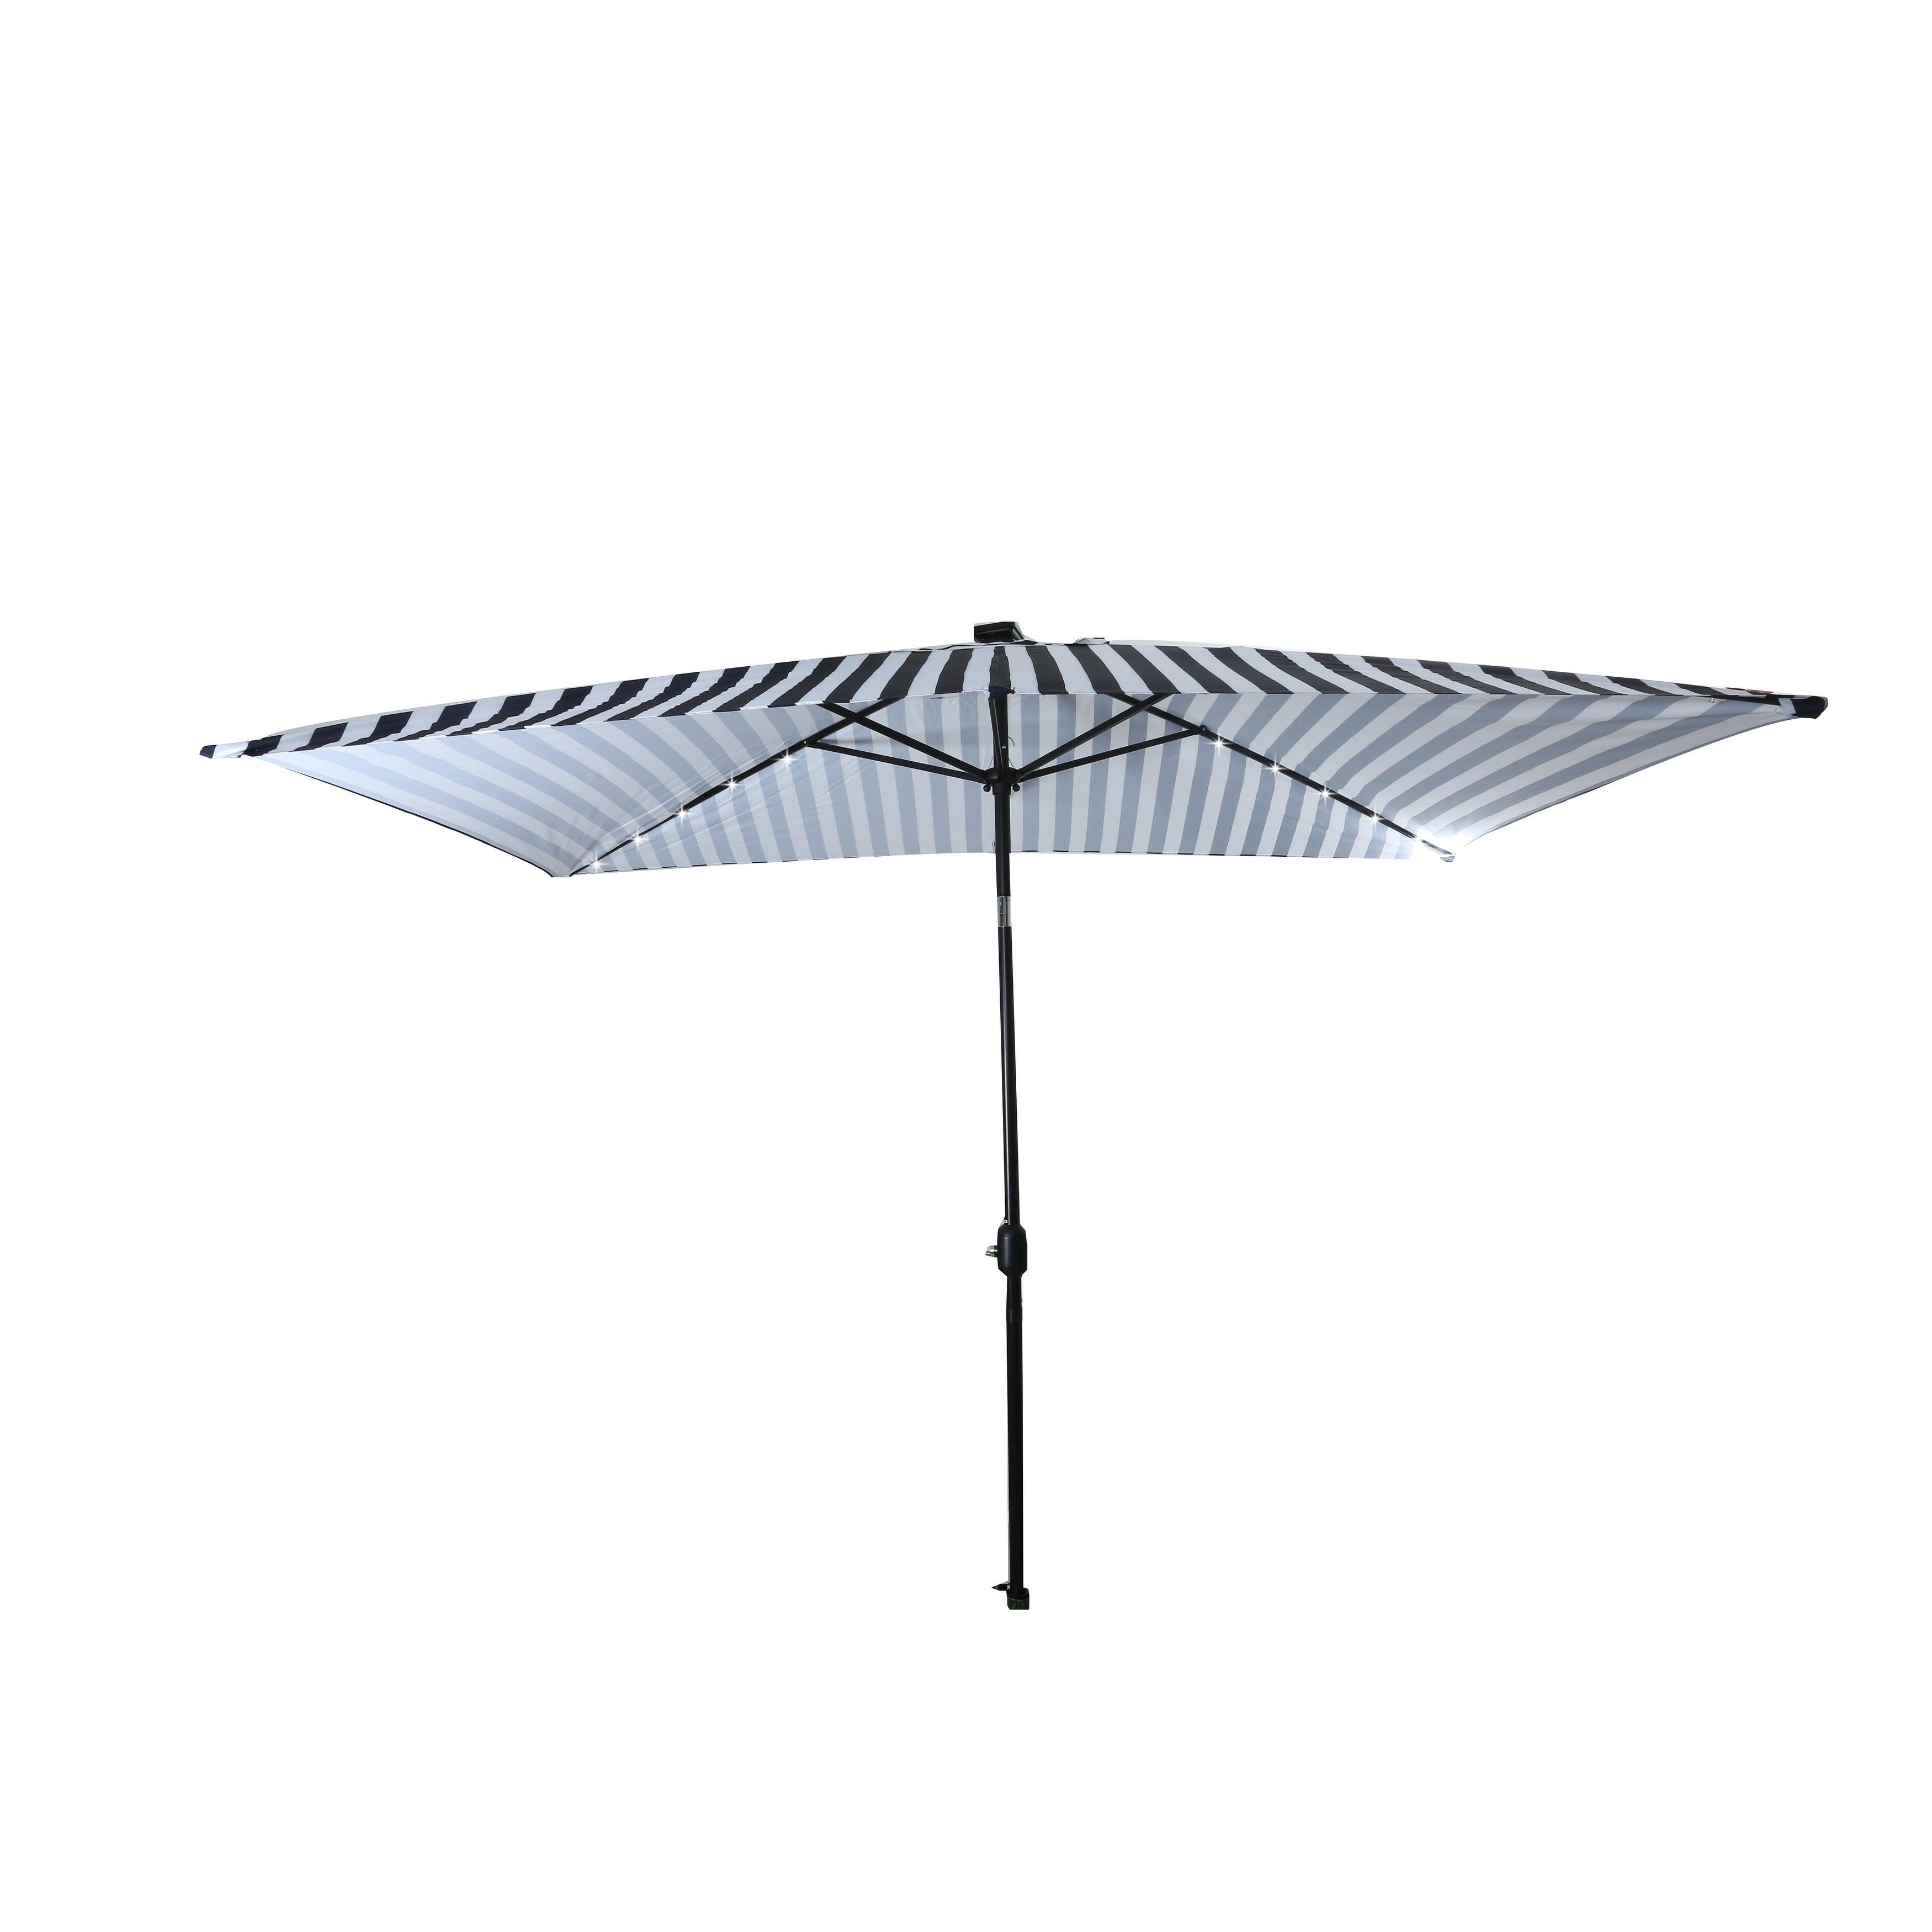 Lighted Patio Umbrella Free Shipping